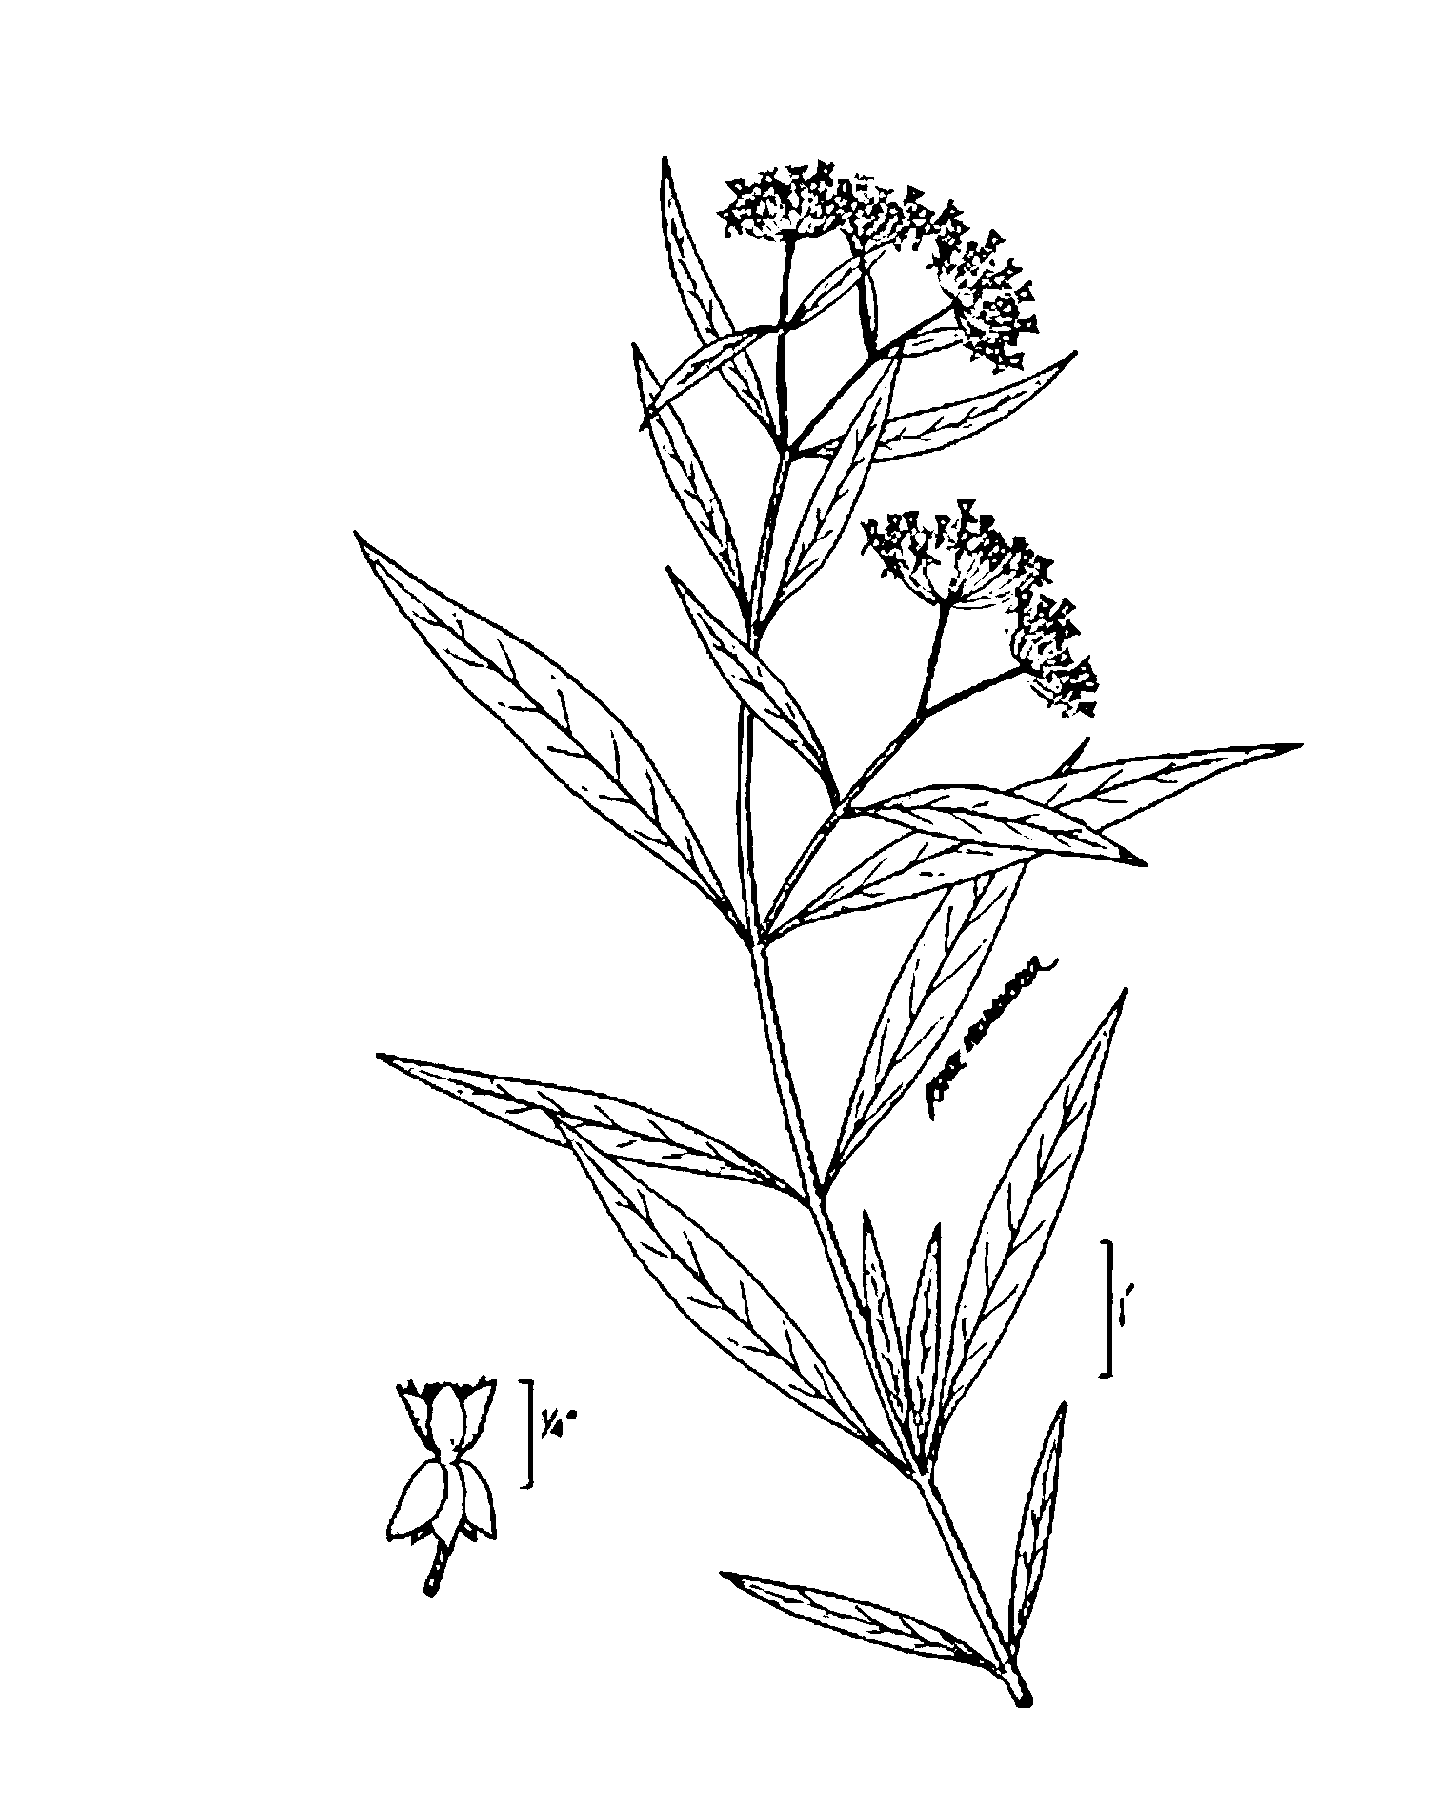 USDA-NRCS PLANTS Database / USDA NRCS. Wetland flora: Field office illustrated guide to plant species. USDA Natural Resources Conservation Service.